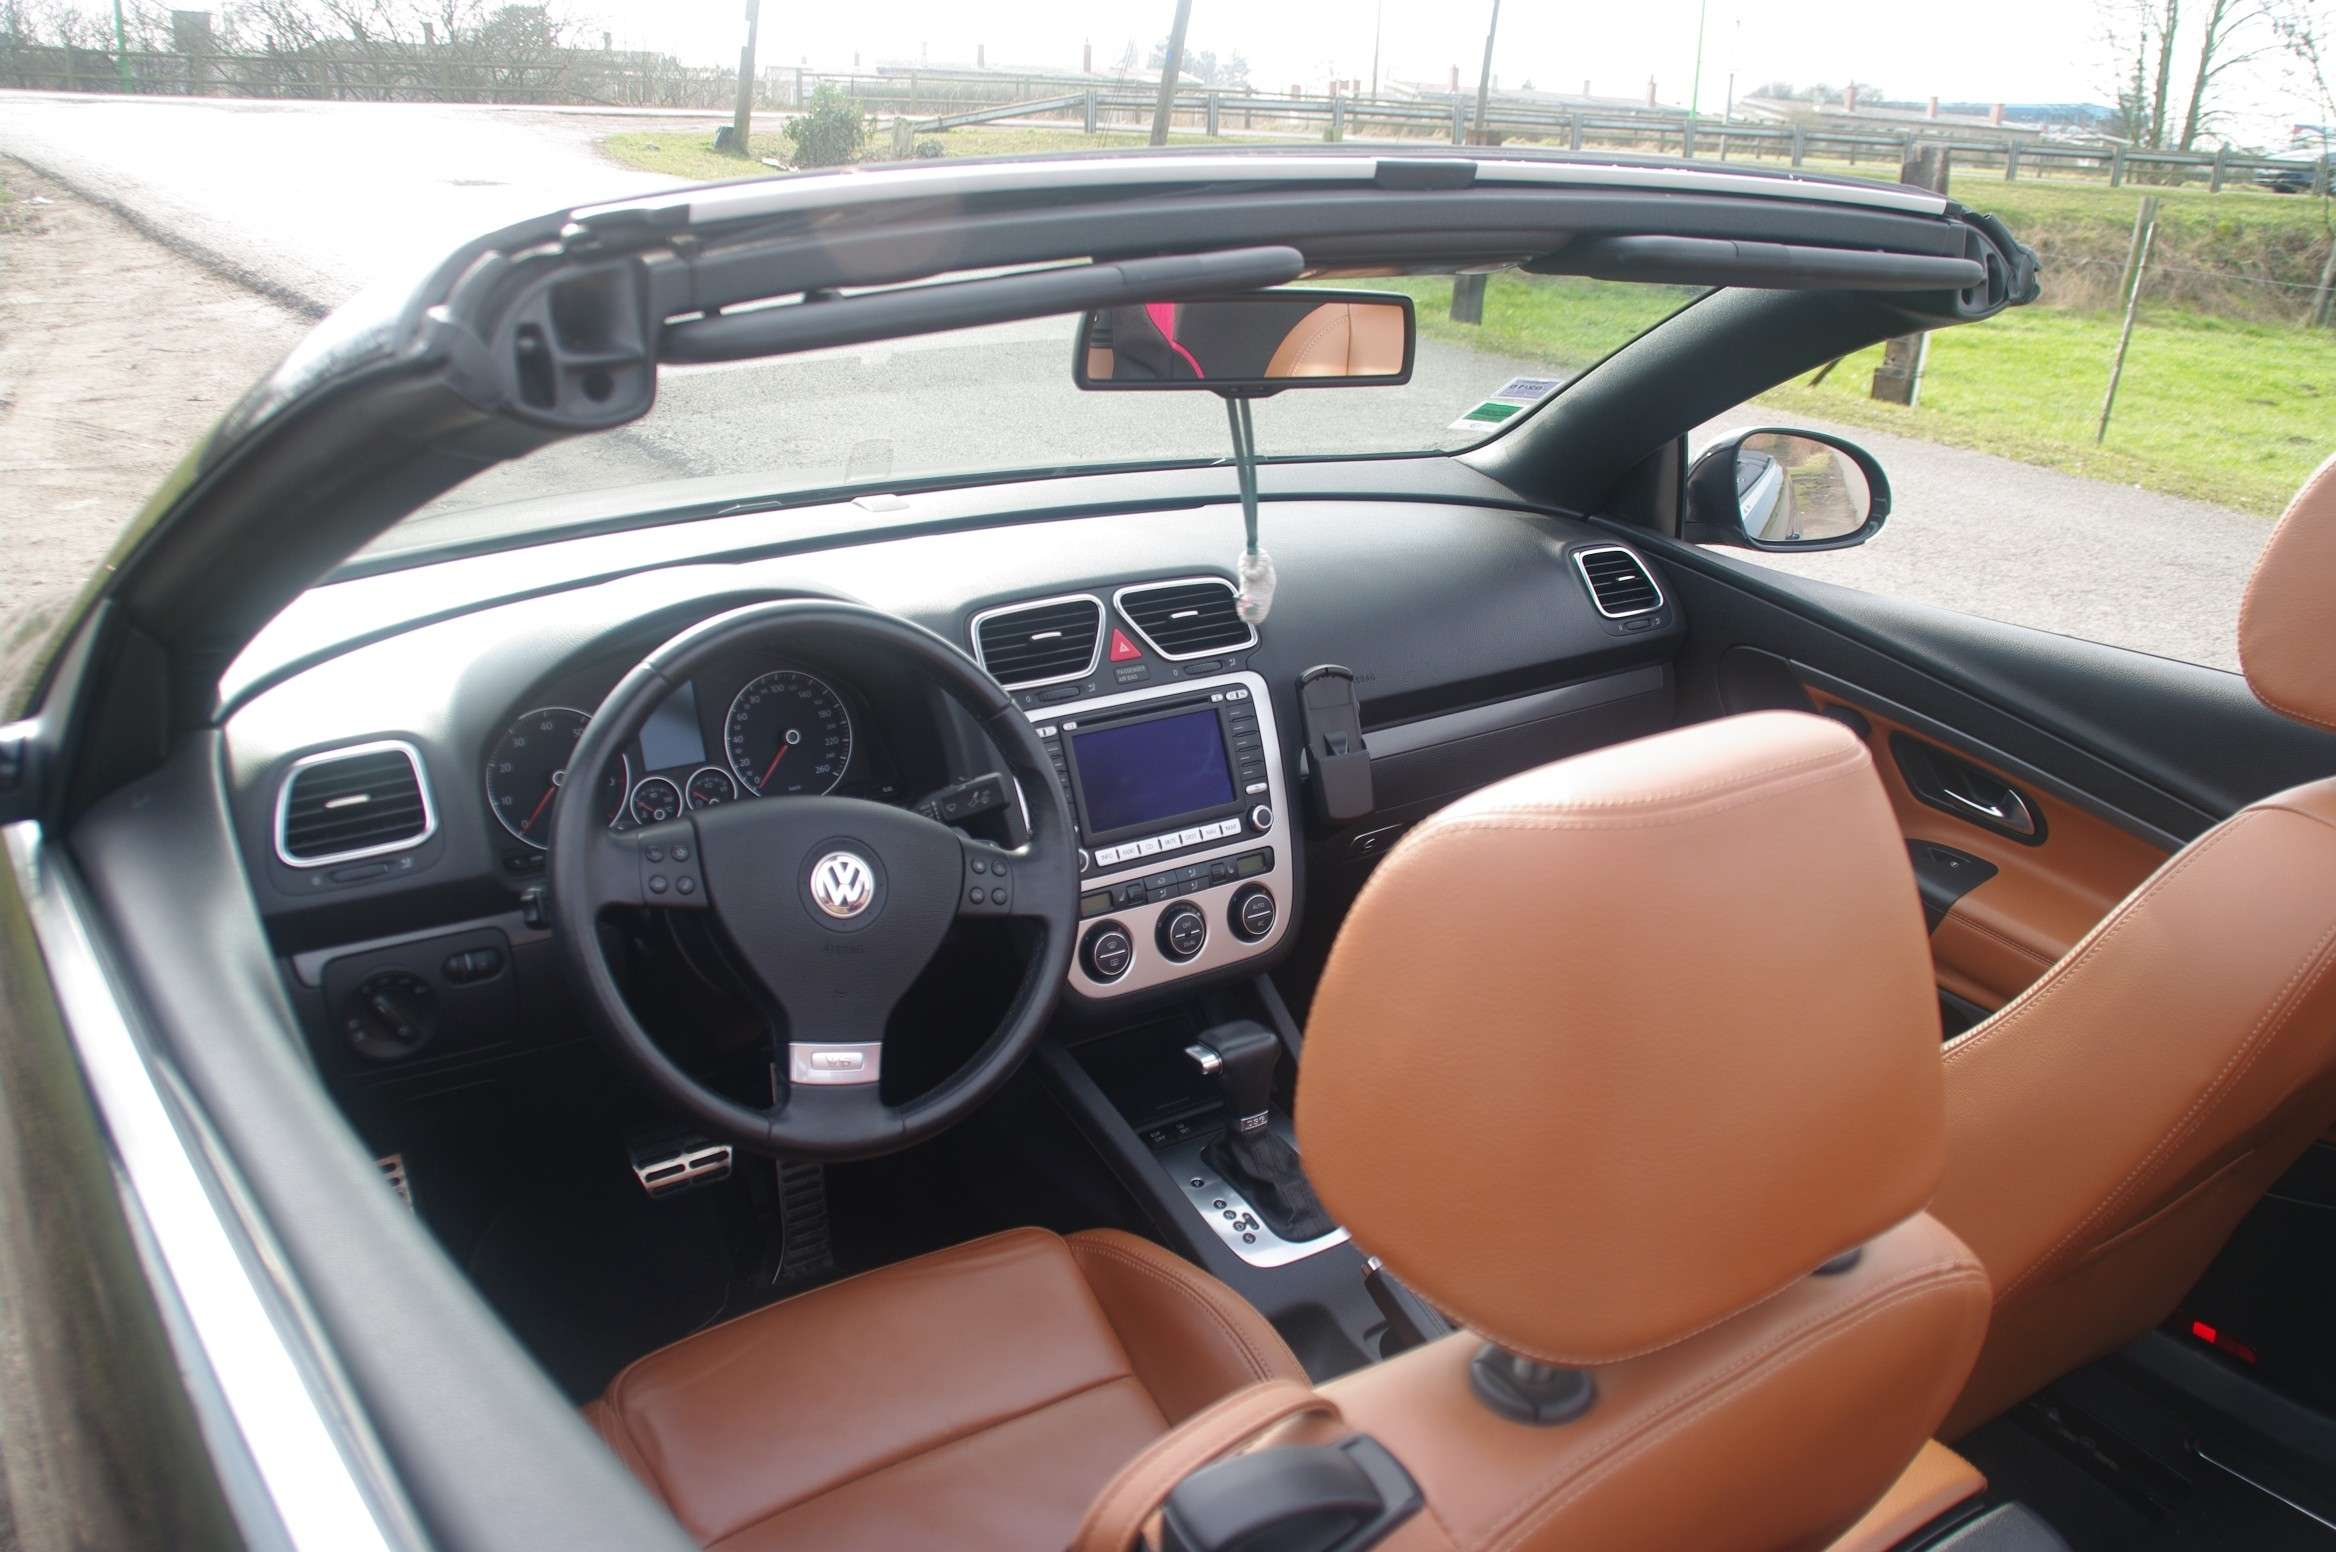 [FURB59] Renaut Clio 5 - Intens TCE 100 Imgp6520